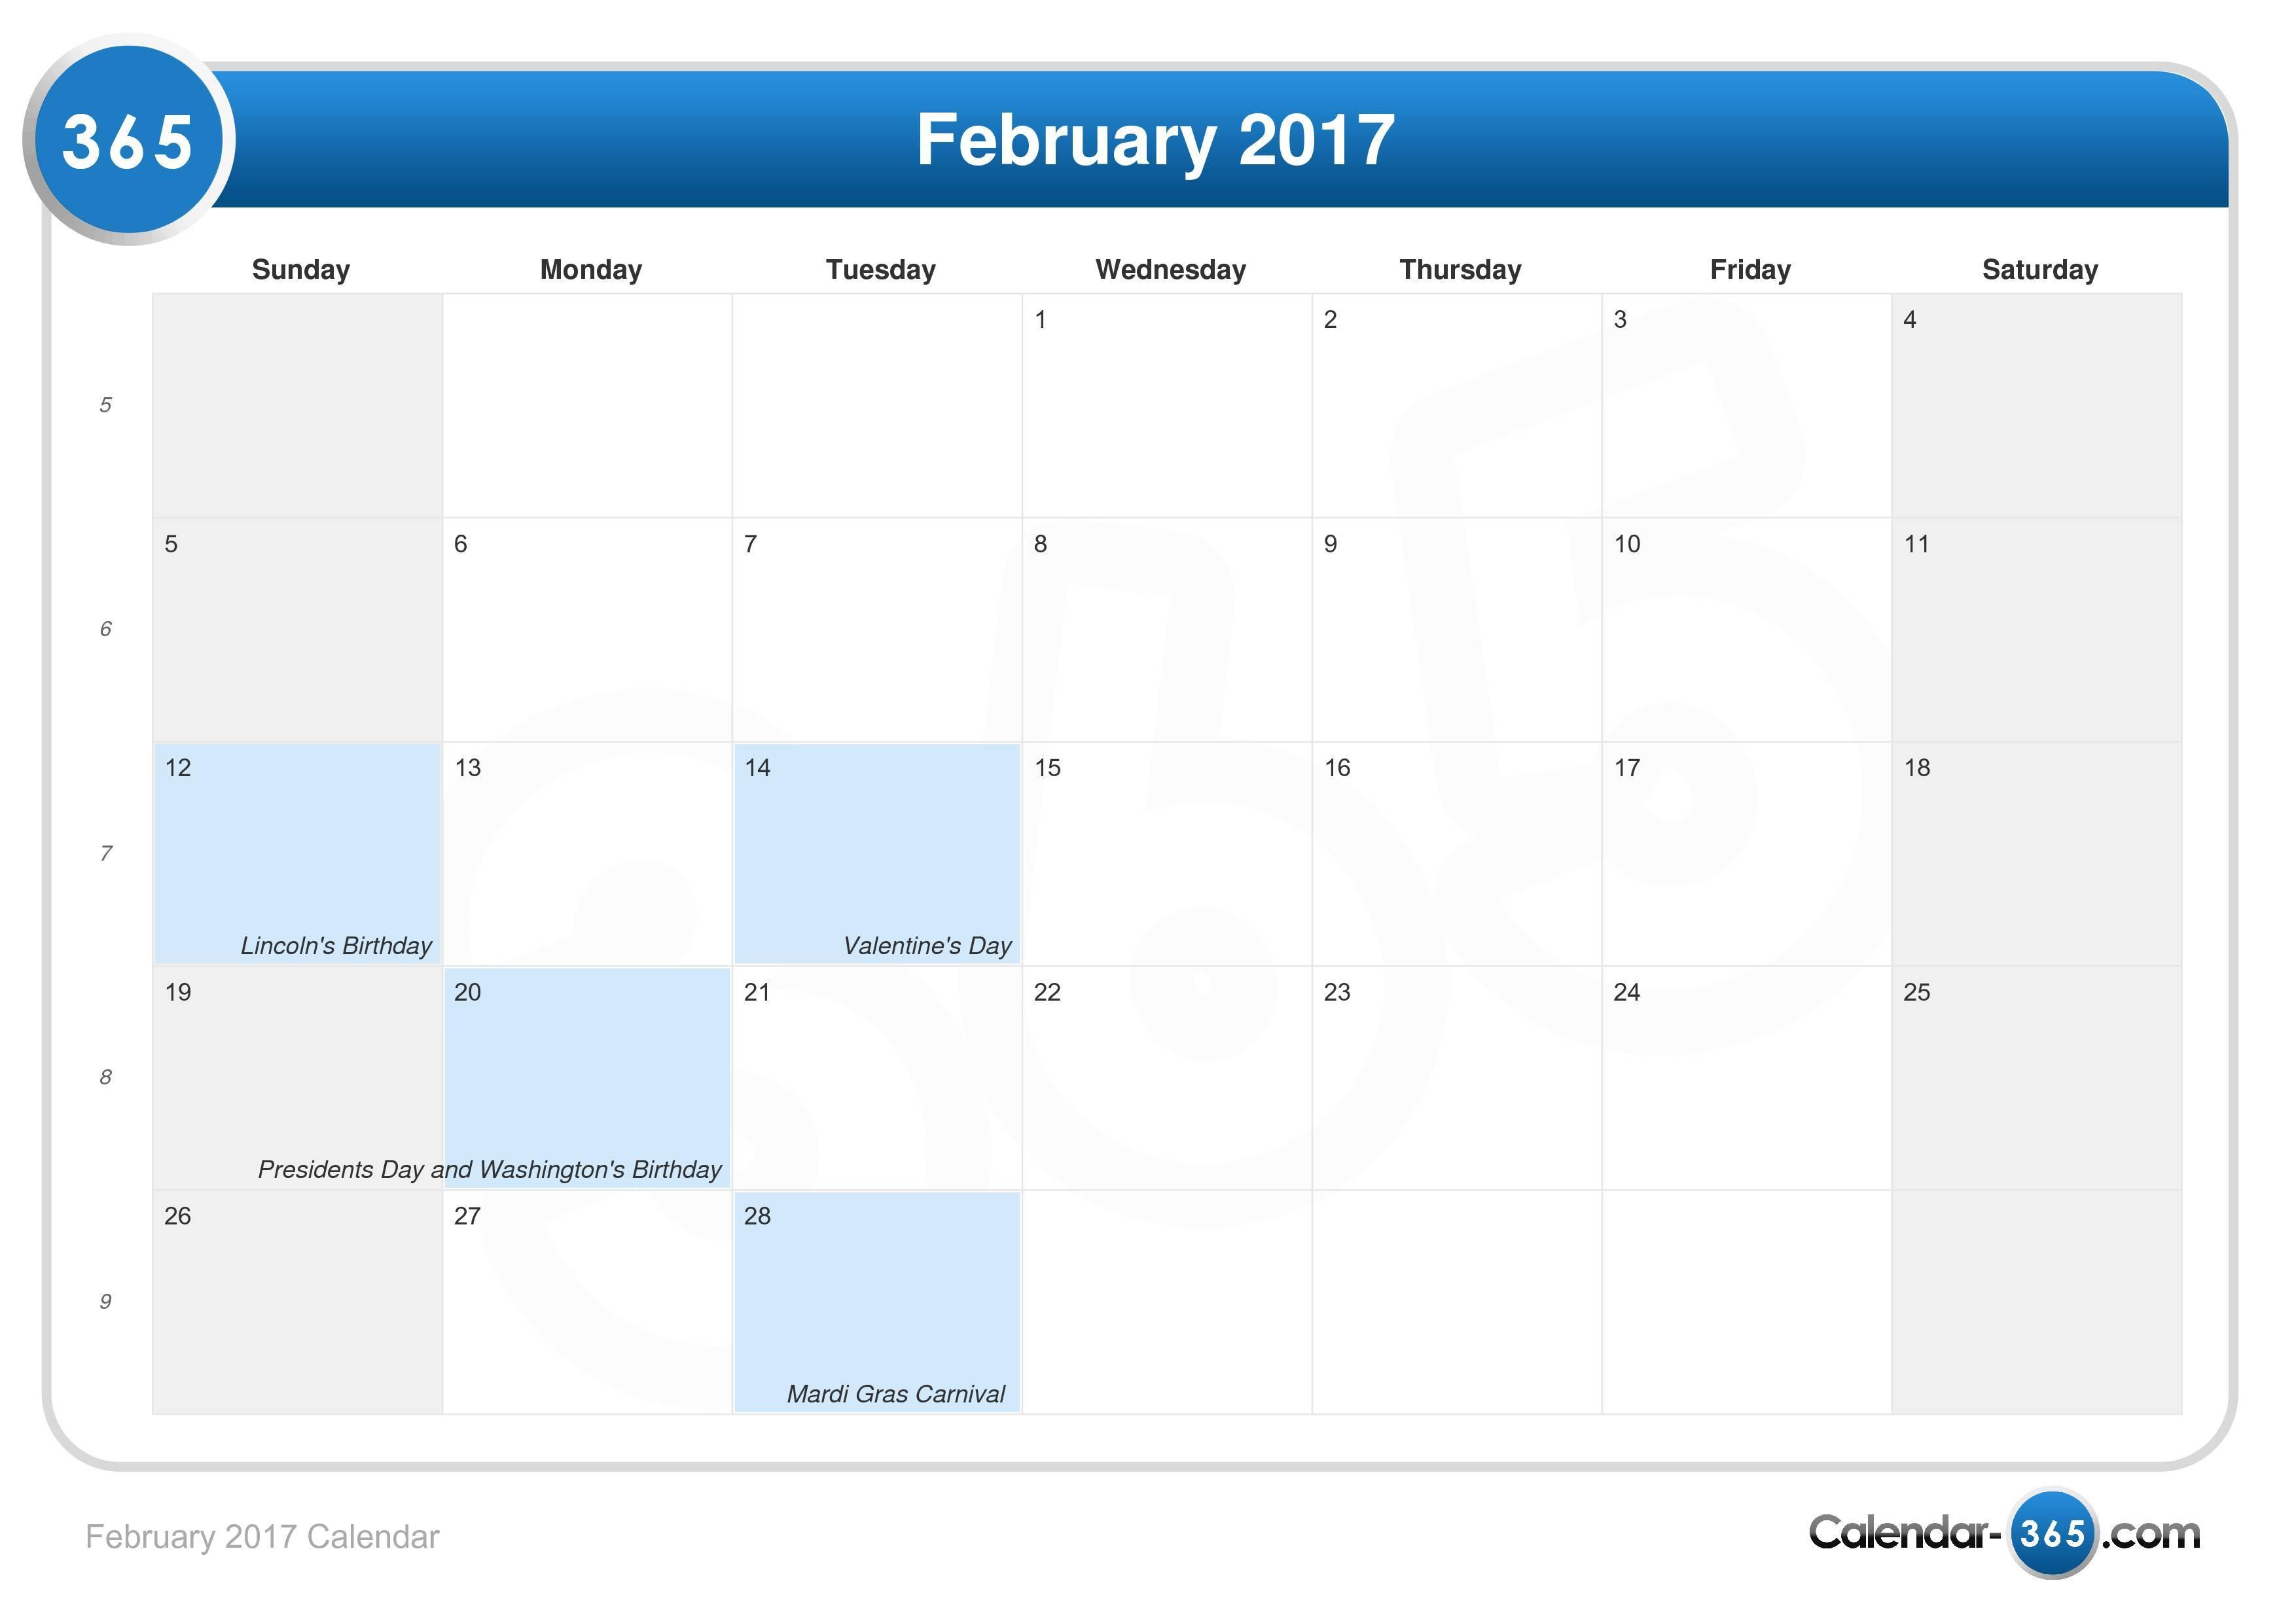 february-2017-calendar.jpg